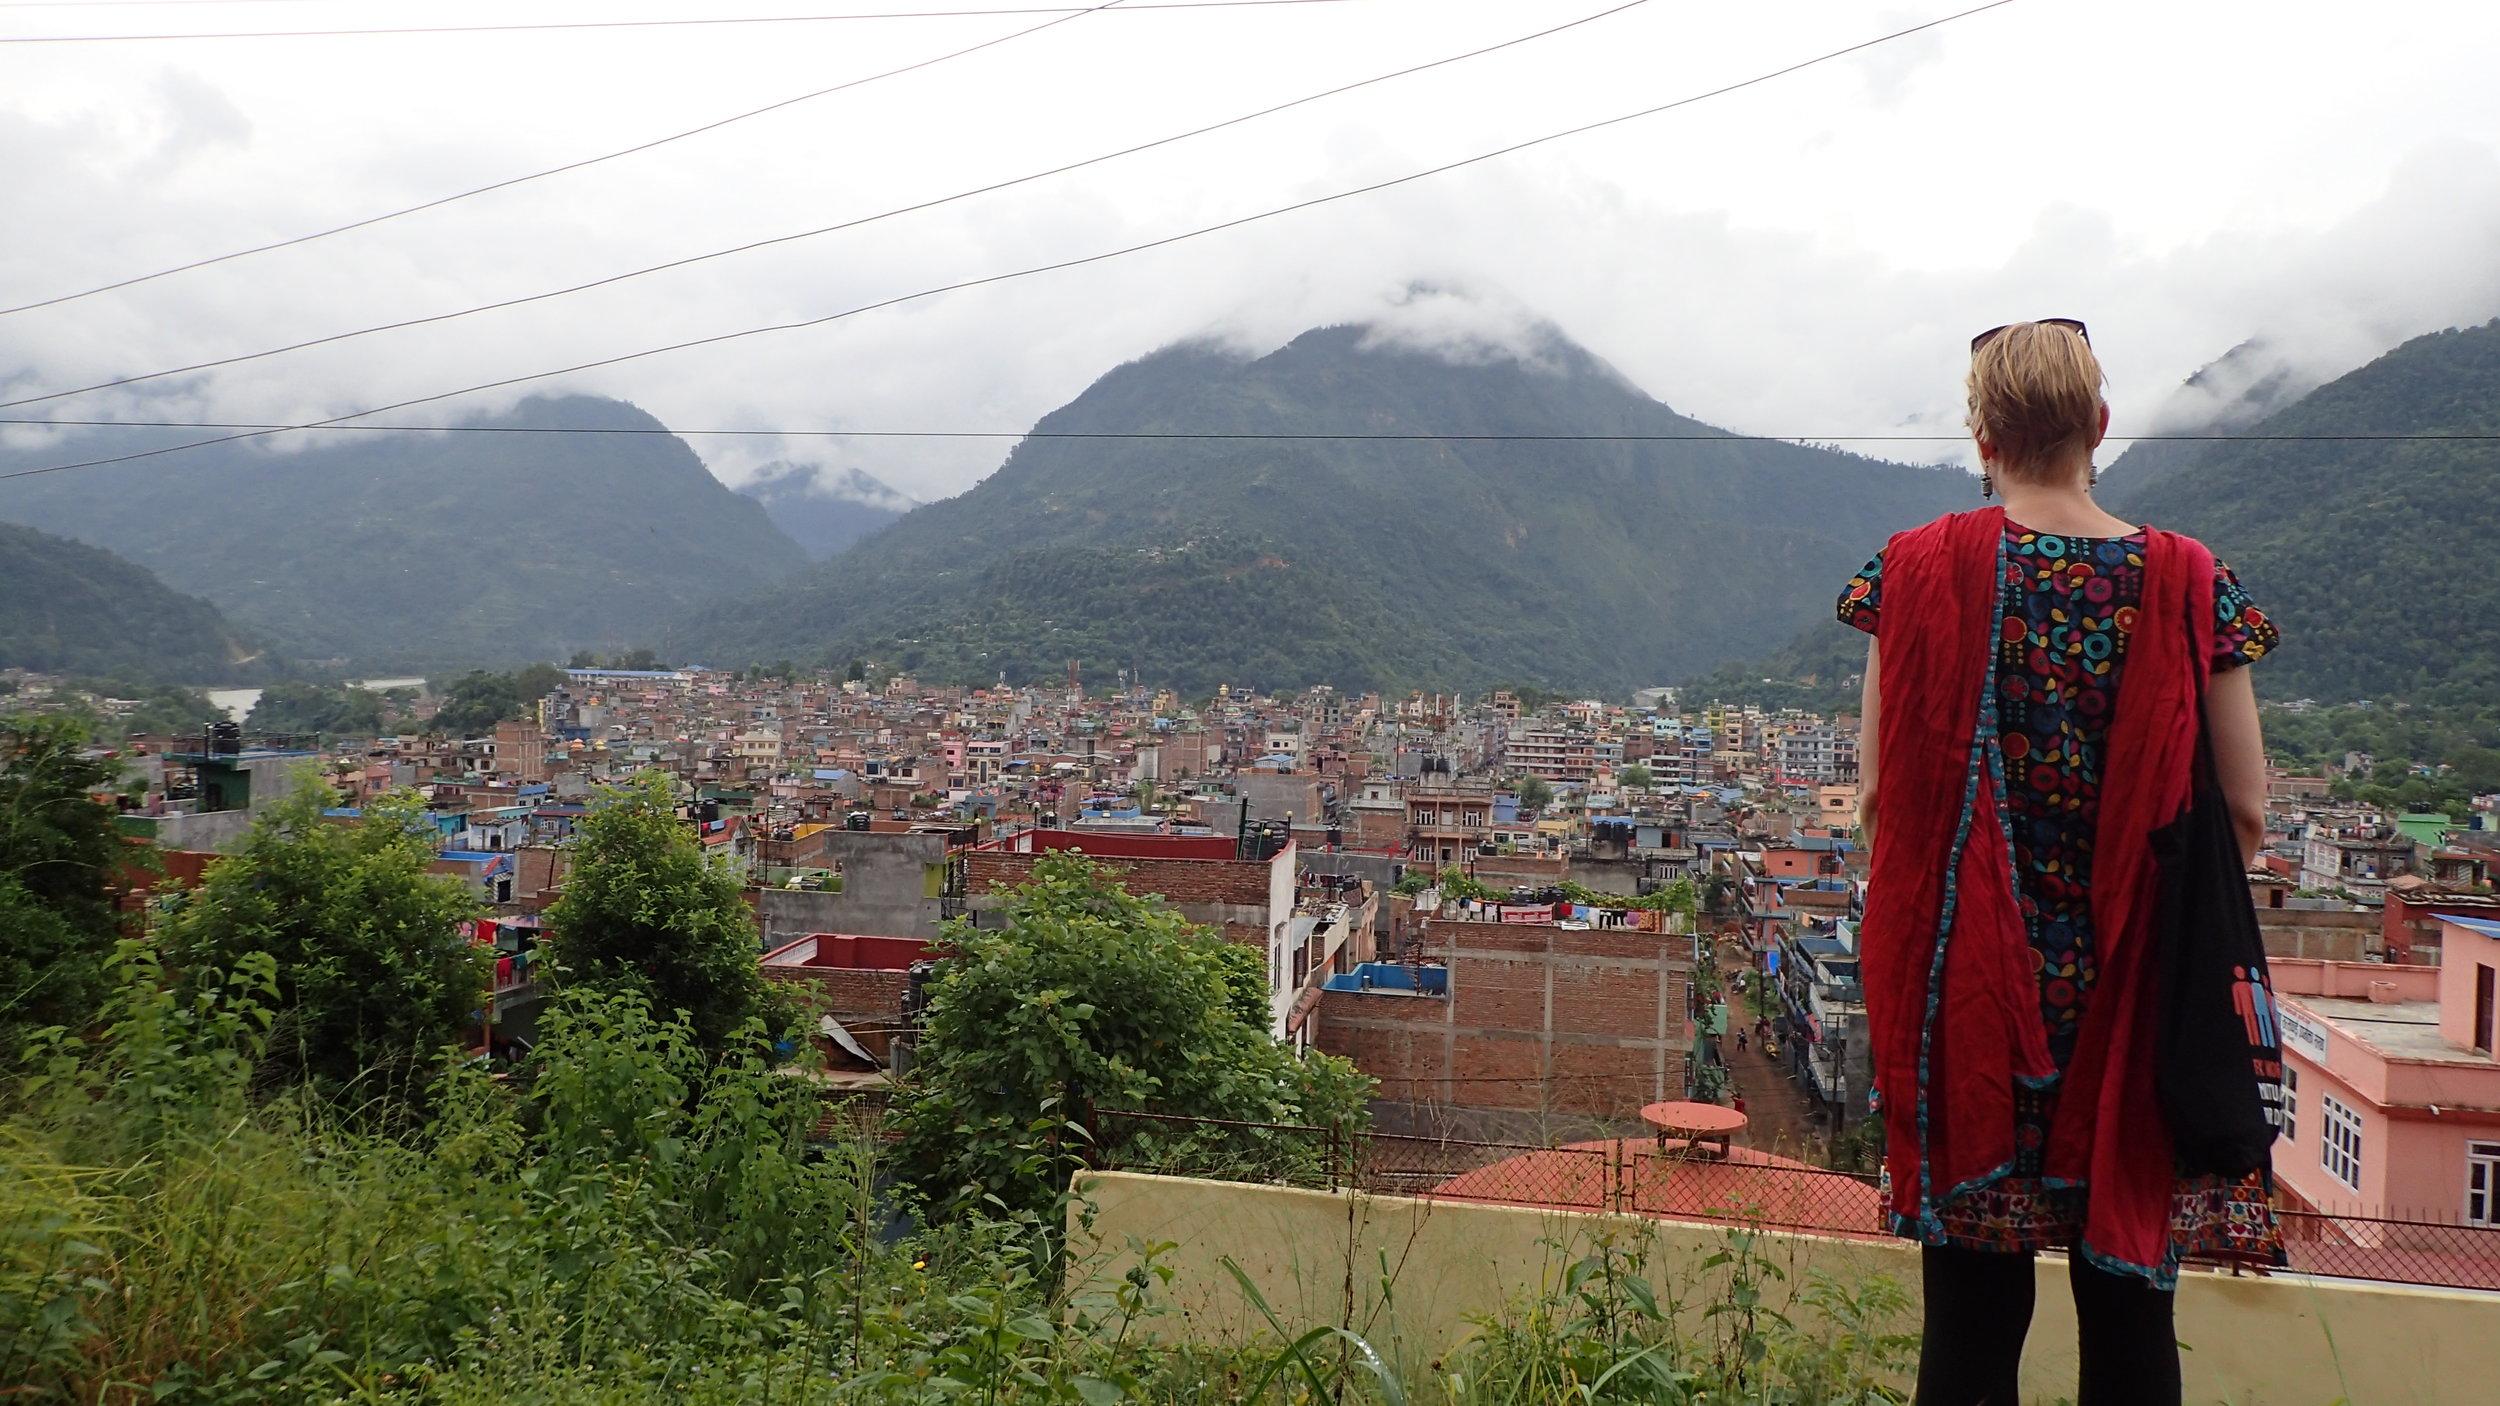 Kathrine O. Flaates adventure for seeking the mountain view. Photo: Ola Opdal